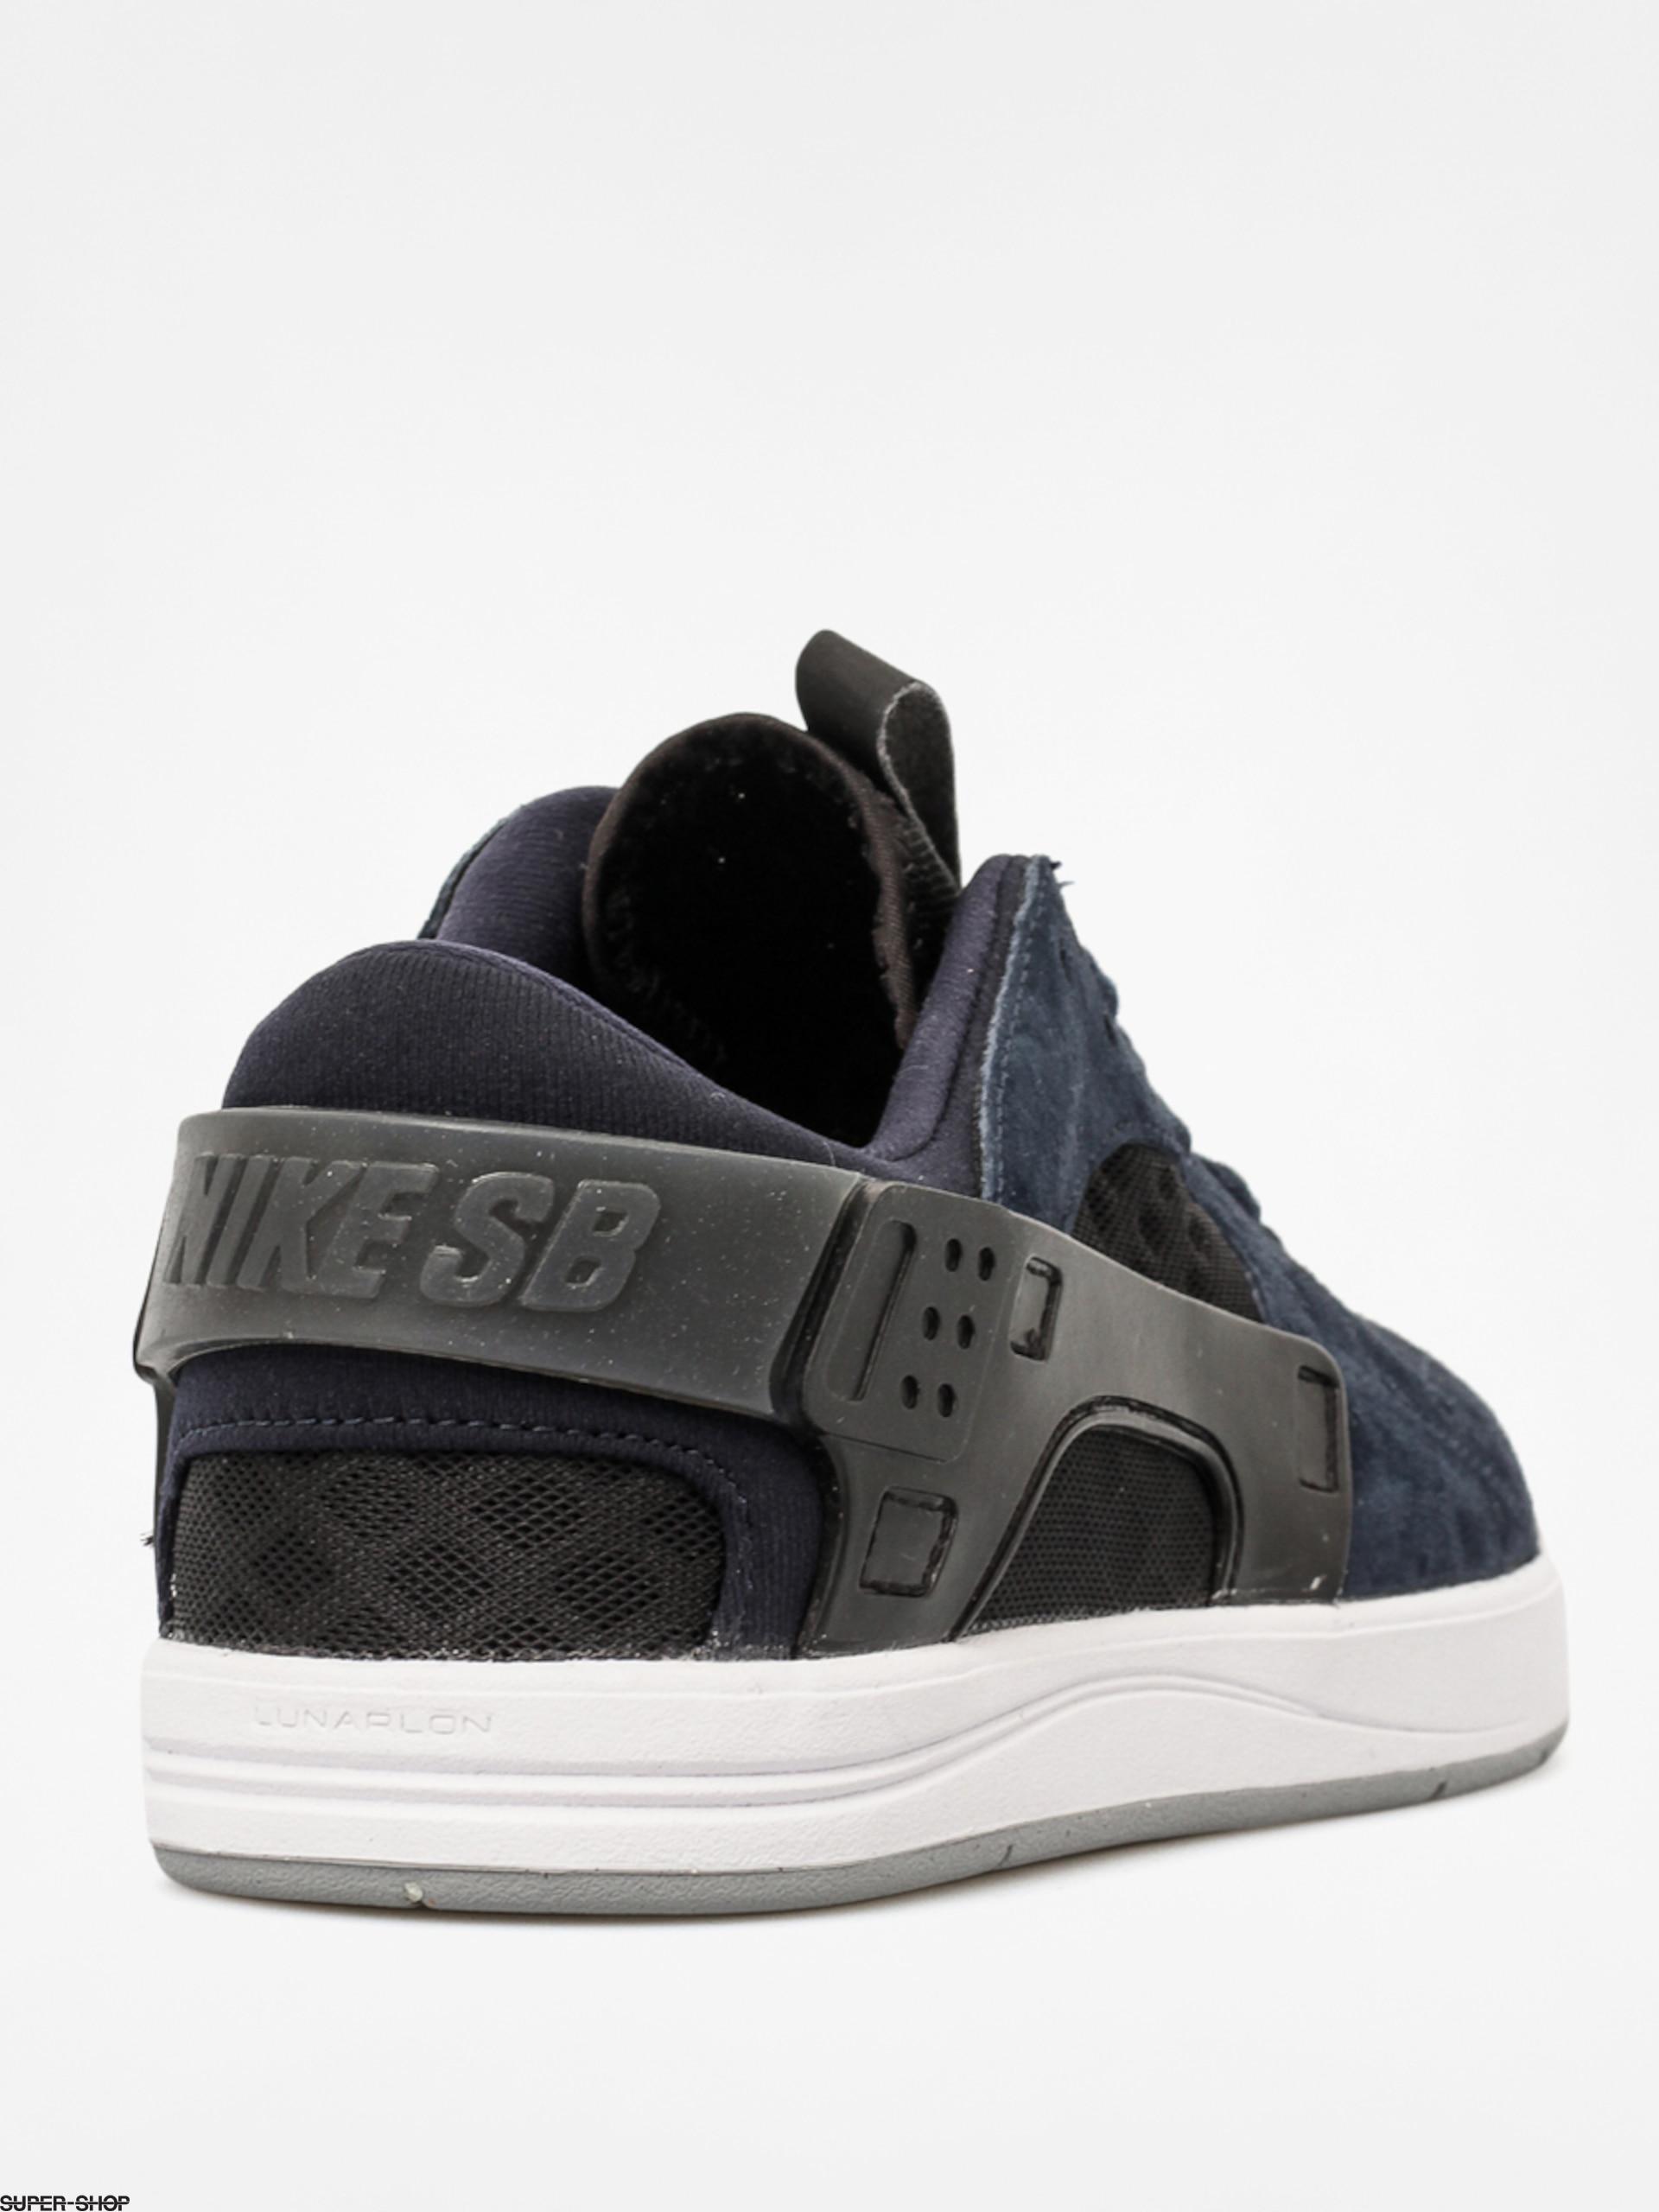 56bbdcada555 Nike Shoes Eric Koston Huarache (drk obsidian white blk wlf gry)